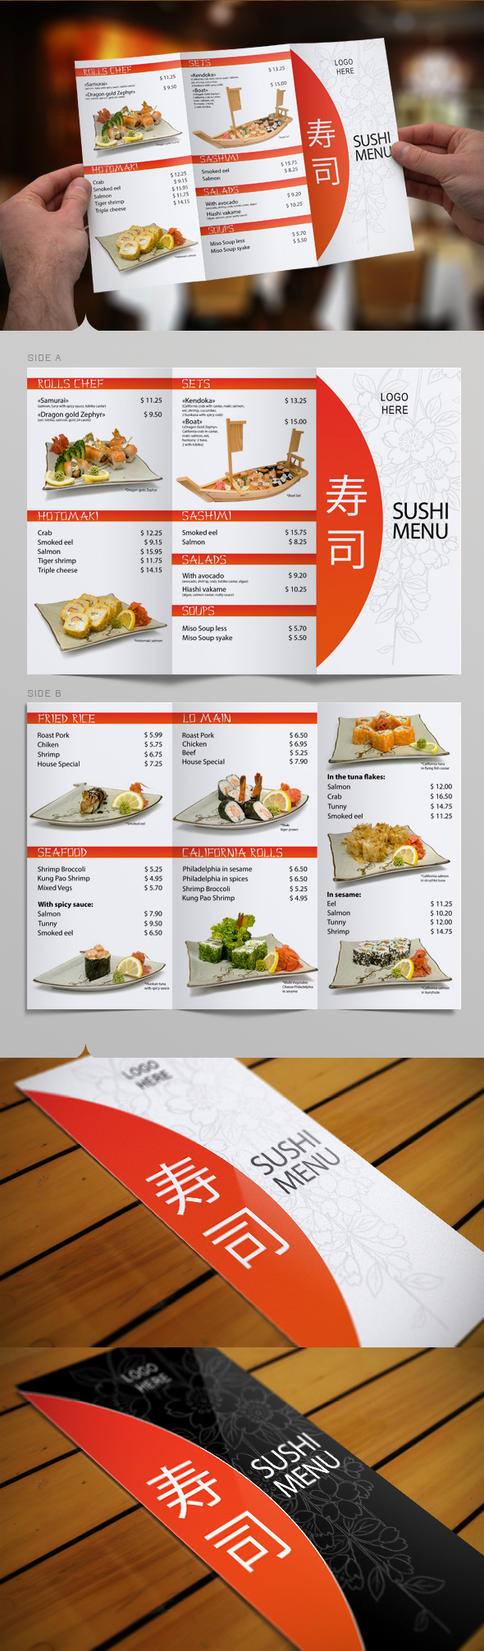 tri fold sushi menu template by itembridge on deviantart. Black Bedroom Furniture Sets. Home Design Ideas